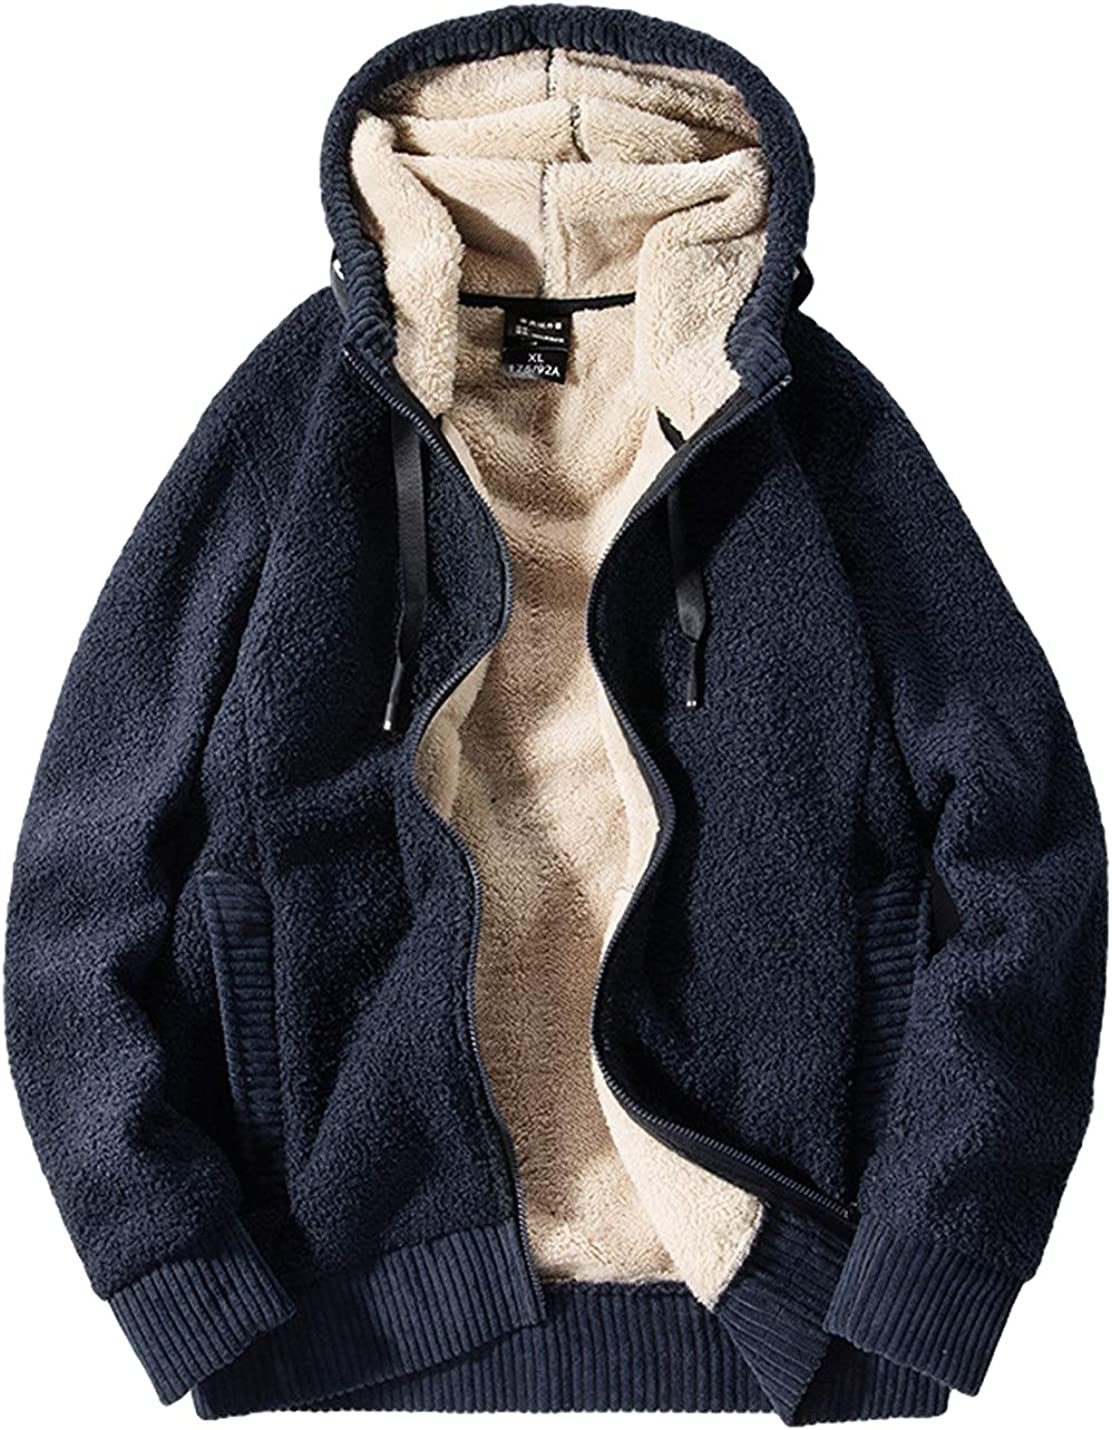 Time sale Gihuo Men's Winter Sherpa Lined Hoodie Ja Zip Sweatshirt Many popular brands Warm Up